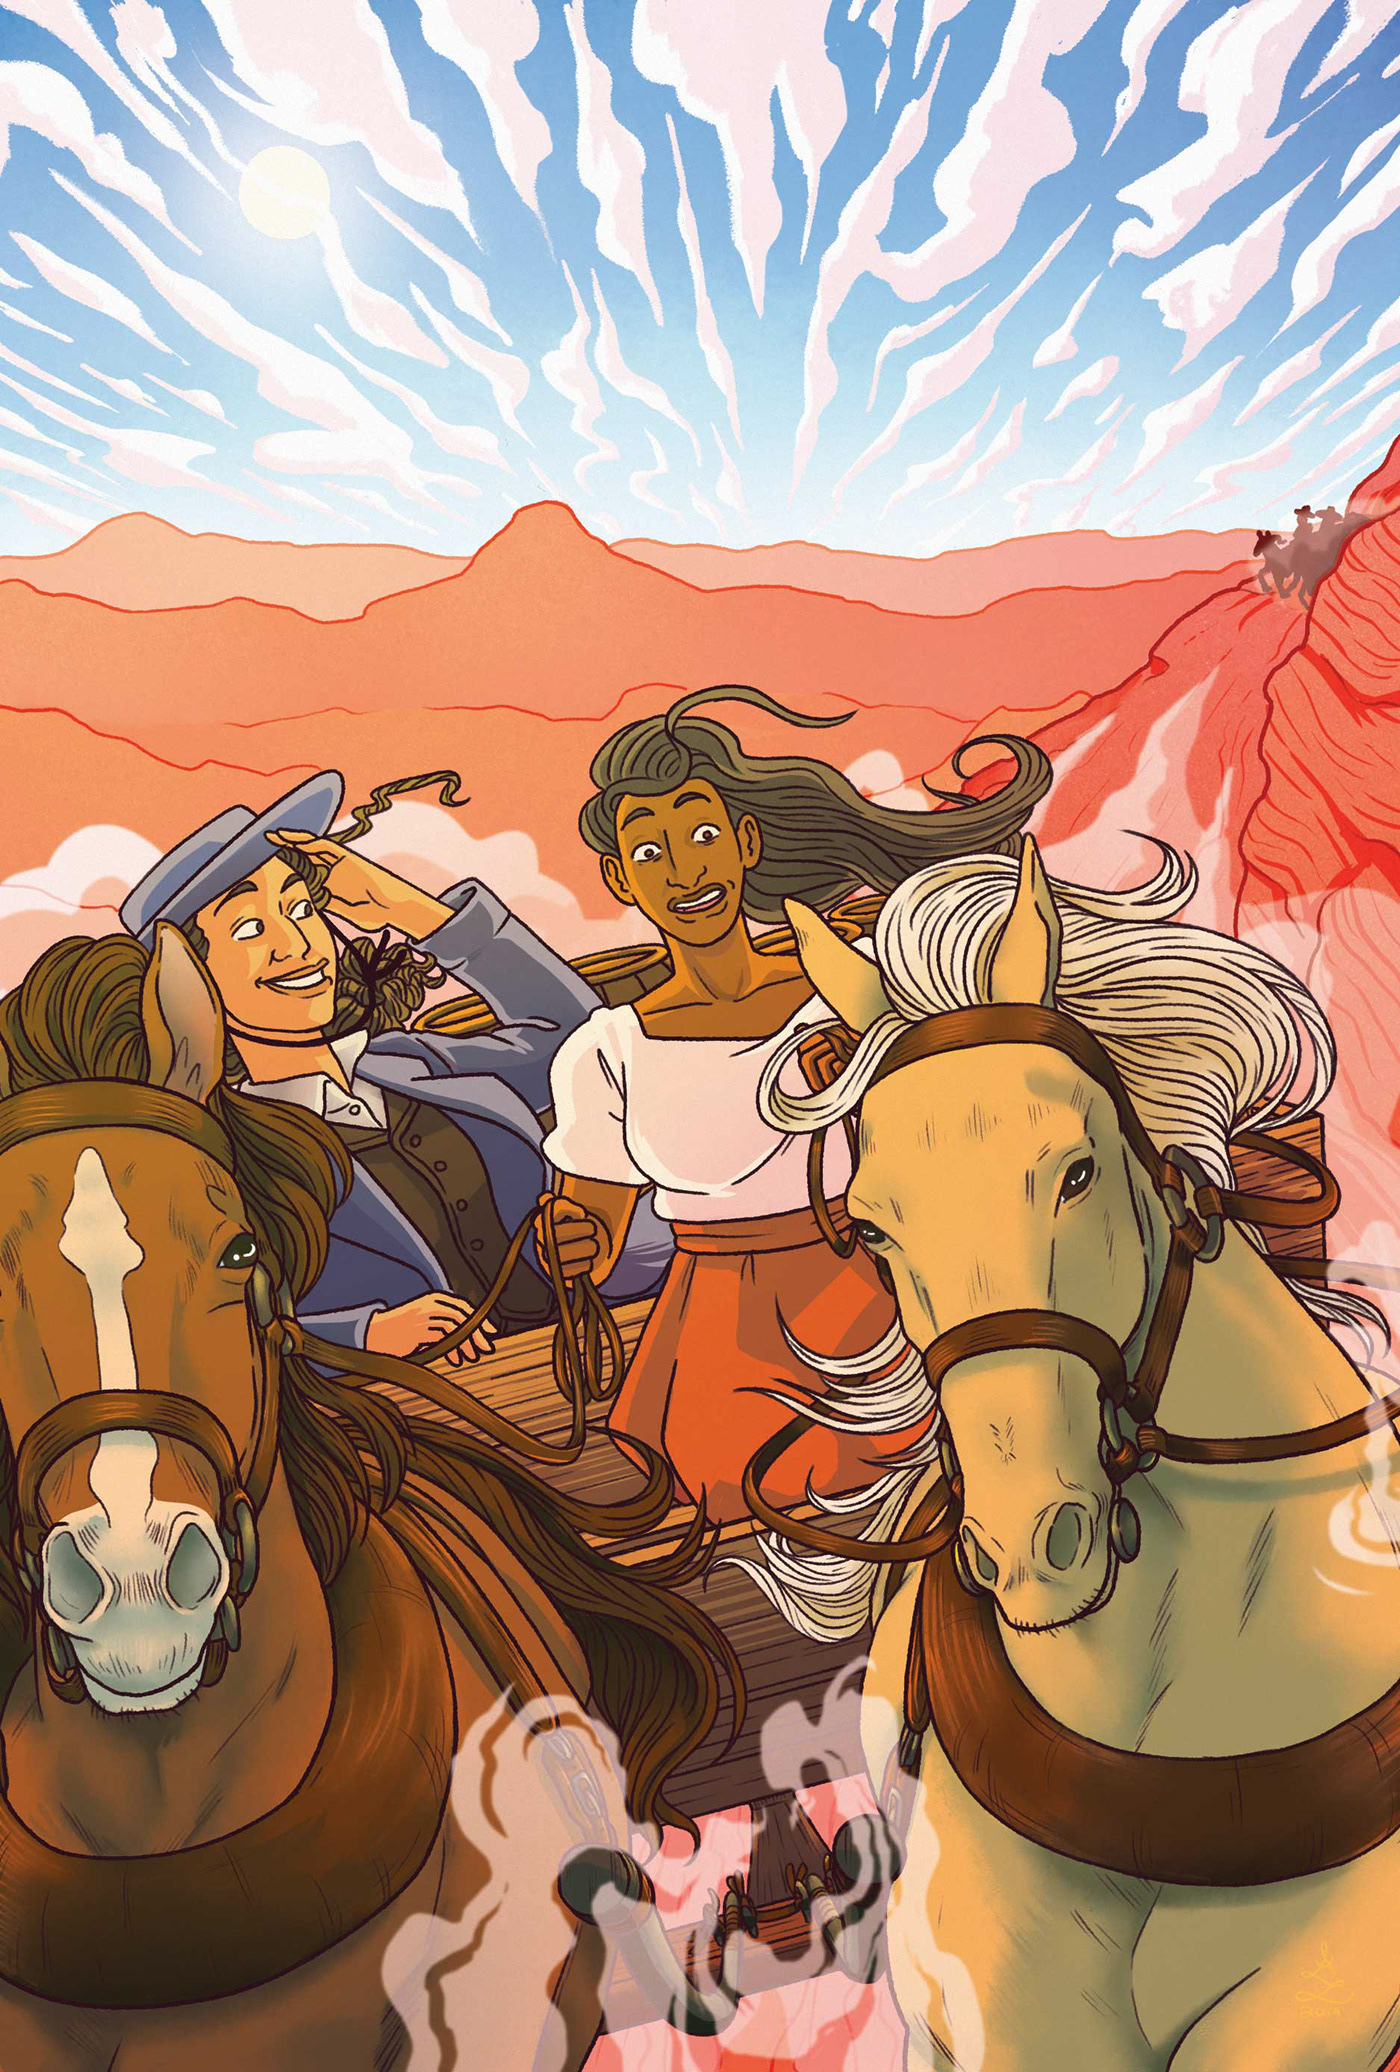 Image may contain: cartoon and horse